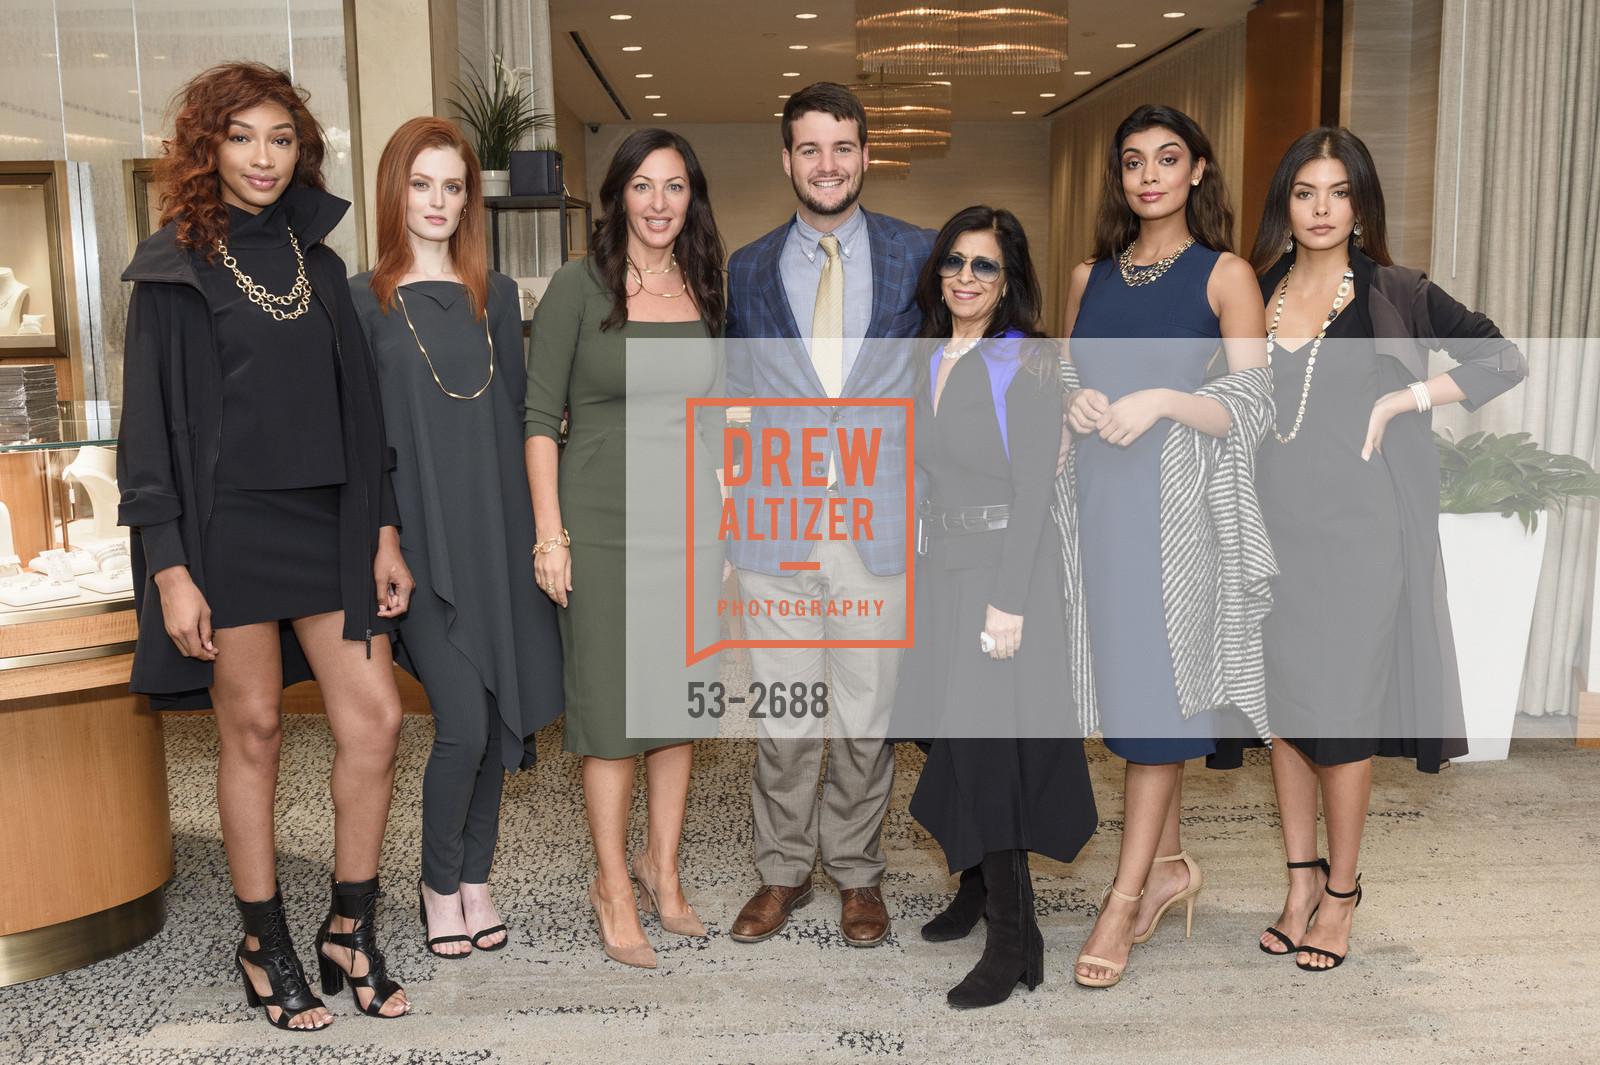 Imani Walton, Moana Holden, Ren Schiffman, Maria Pinto, Ghazal Gill, Leah Morris, Photo #53-2688